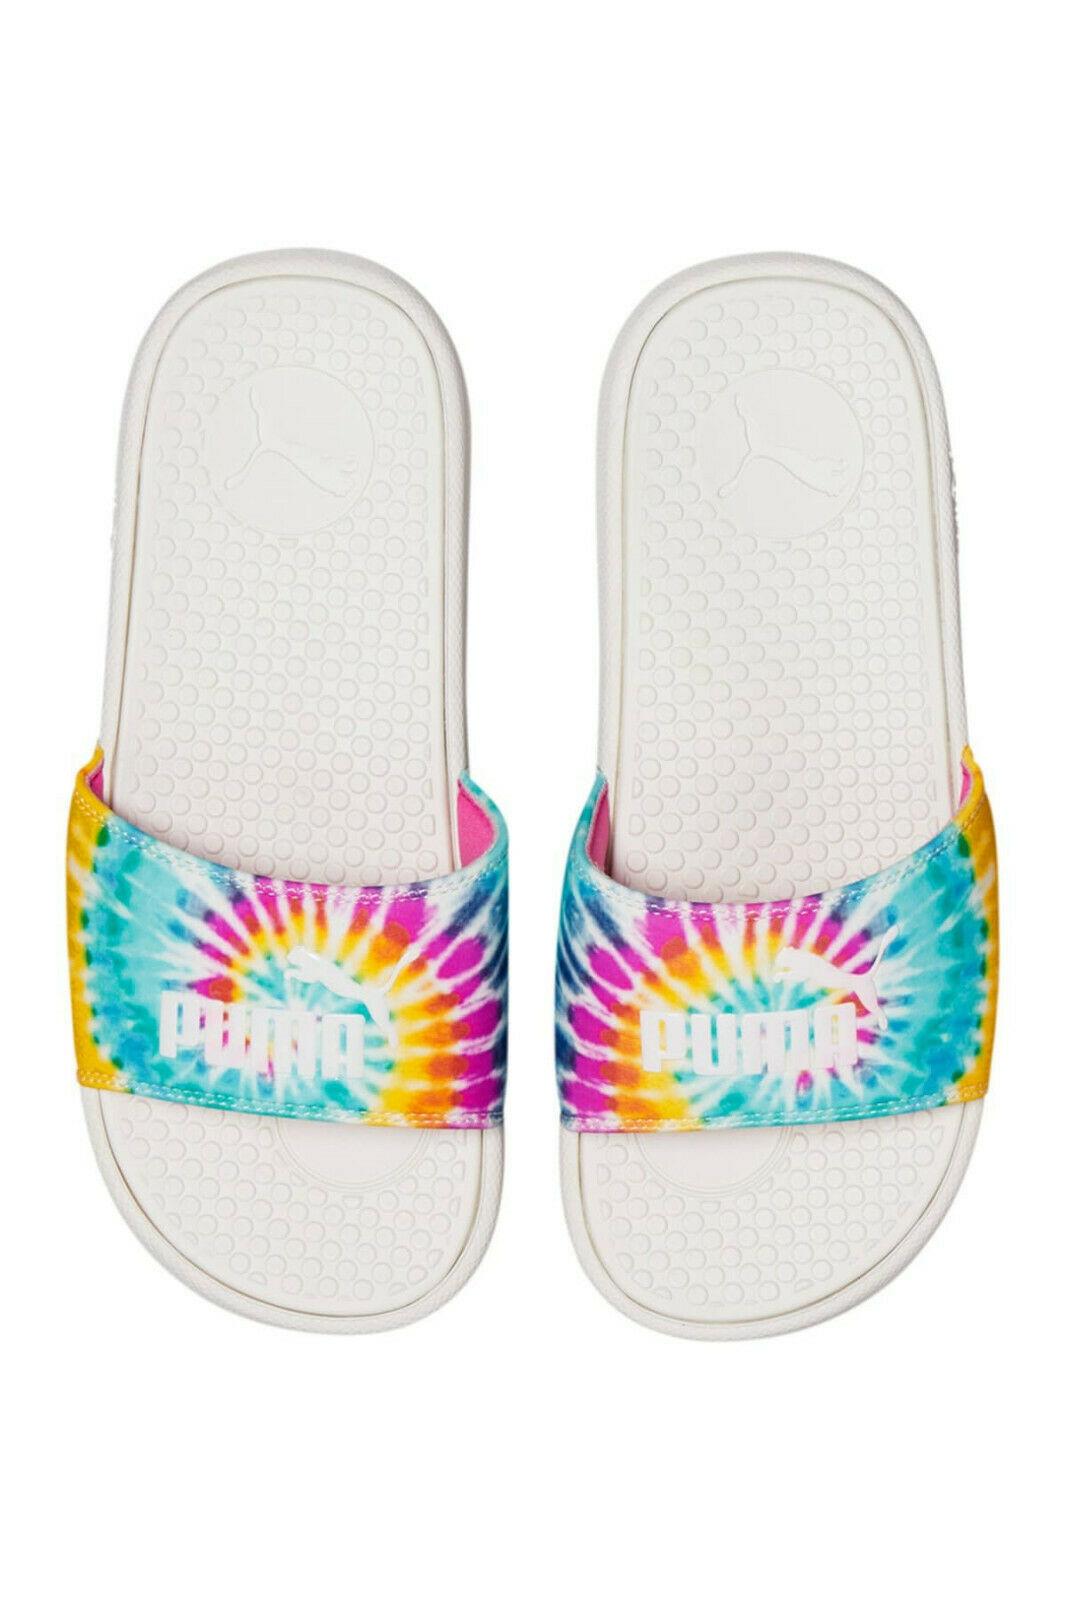 PUMA Women's 38079301 Slide Sandal White Pink Yellow Size 7 - $24.74